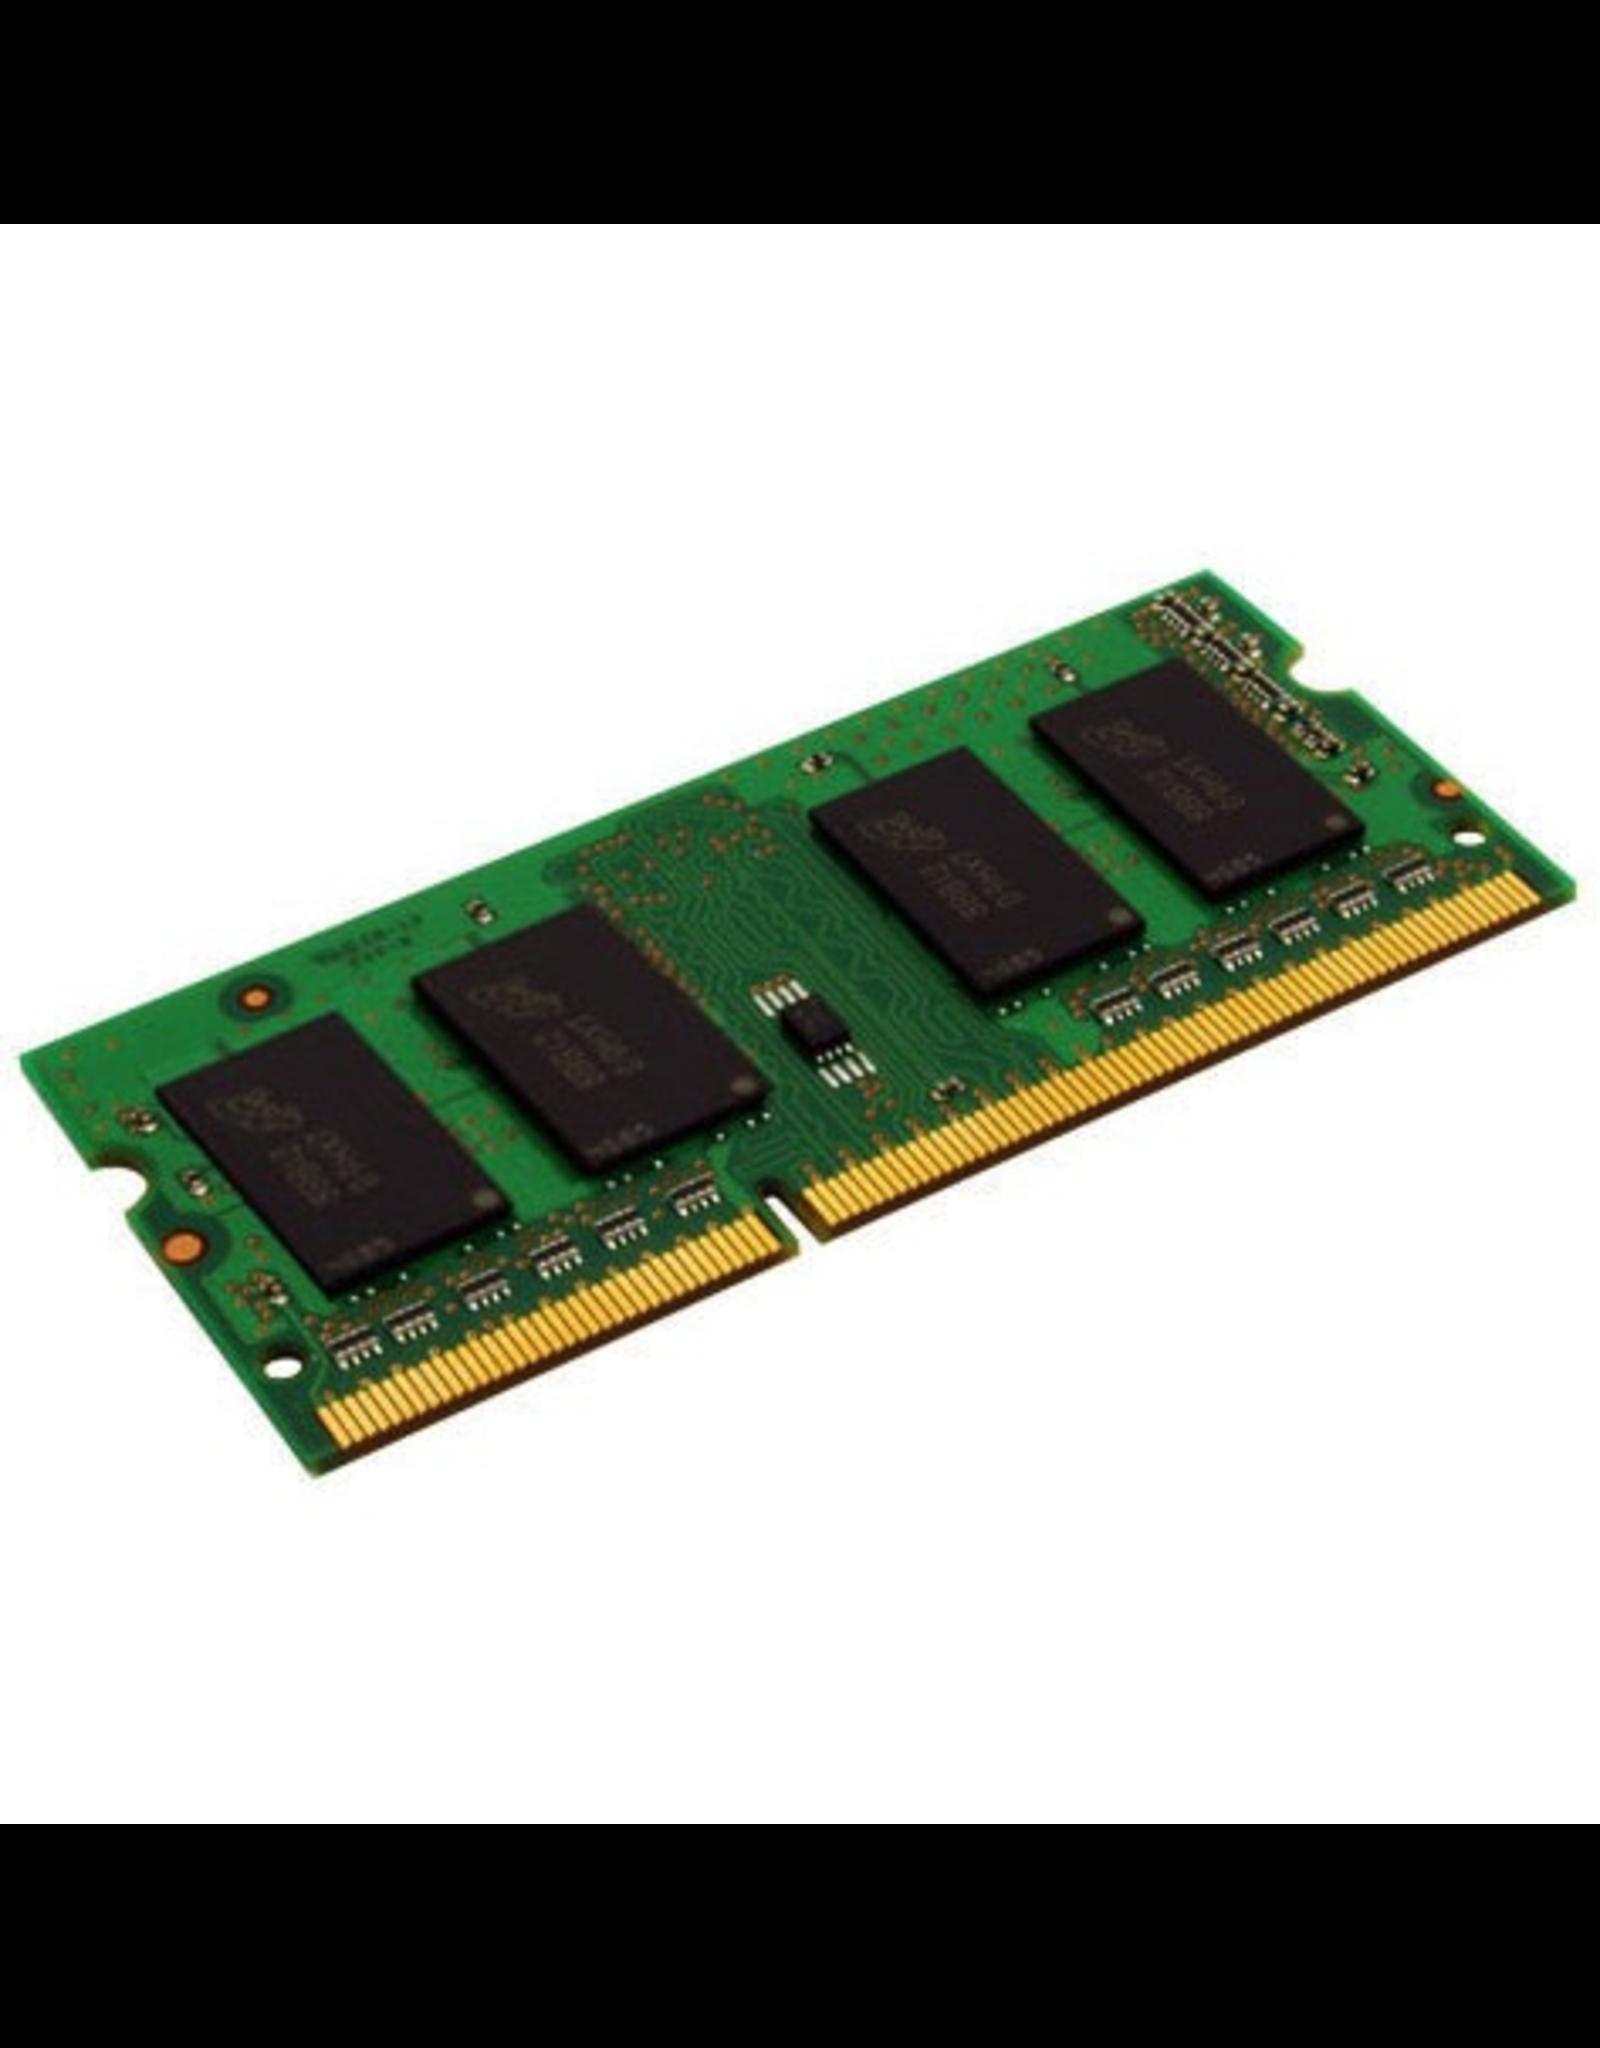 iLove Computers 2GB 1600Mhz (PC12800) DDR3 SODIMM 204 pin RAM Module